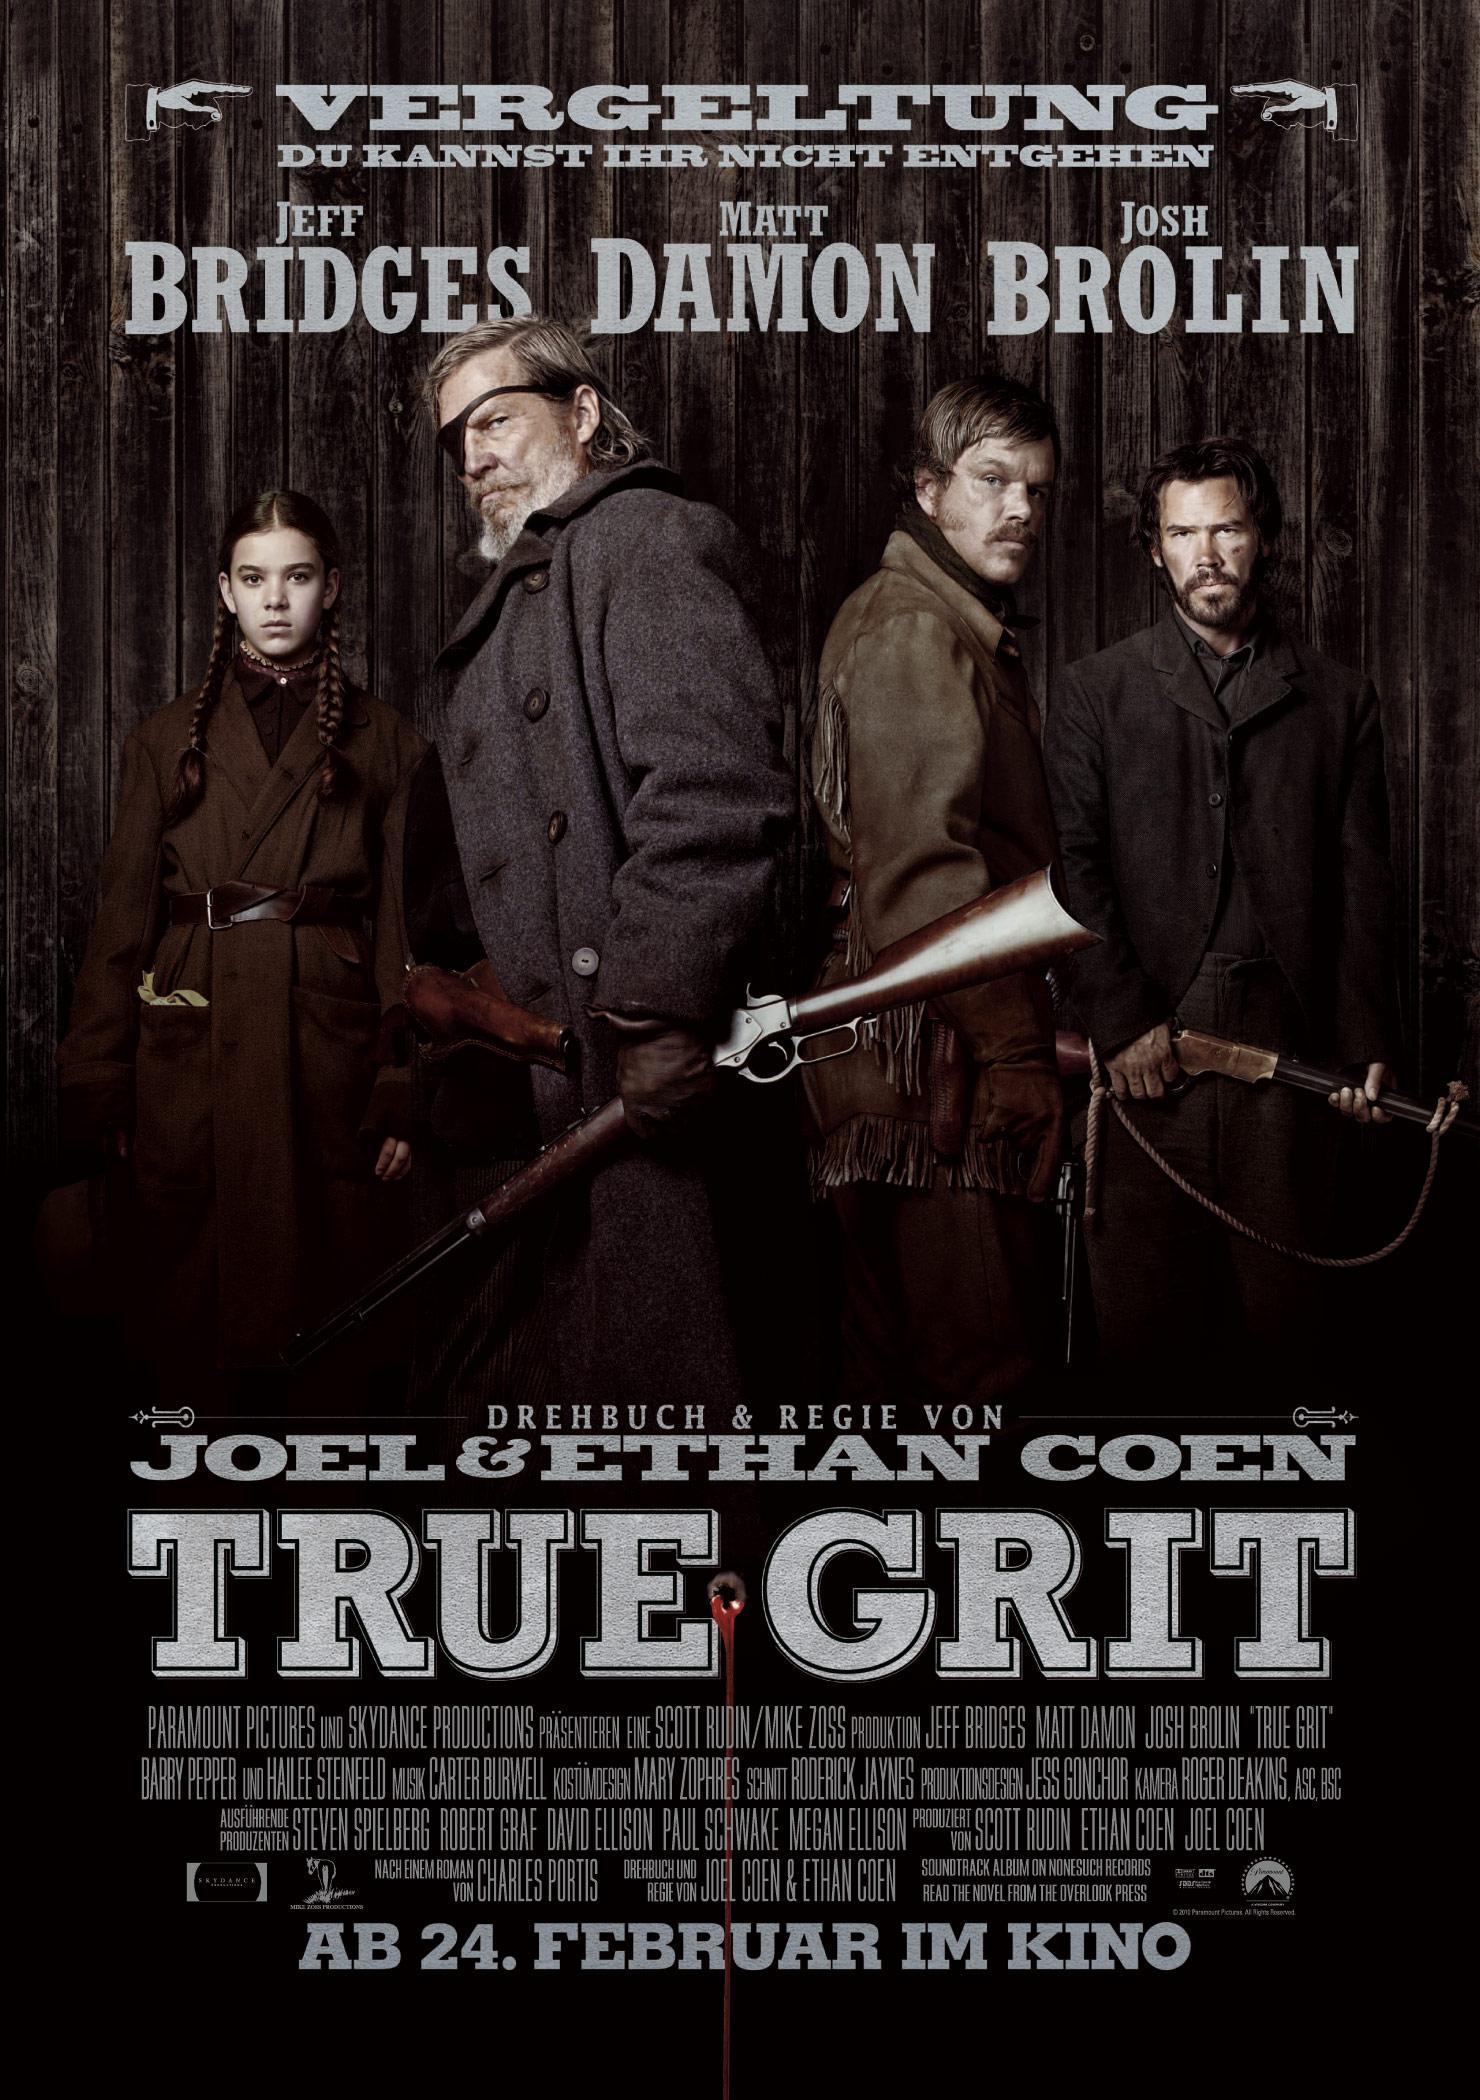 True Grit (Poster)